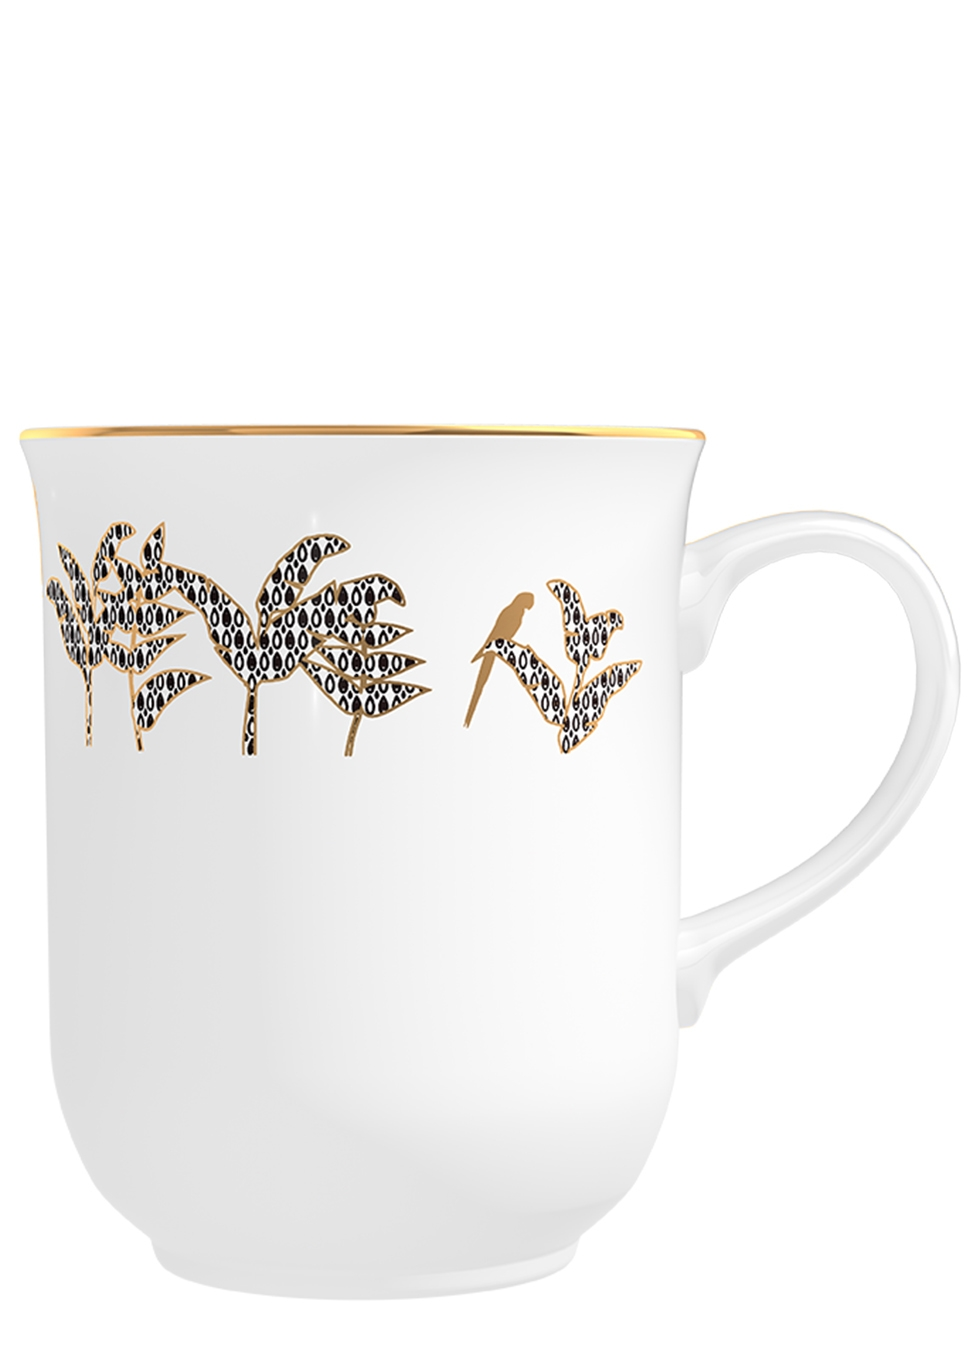 Caramel From Kedu Scented Candle Coffee Mug 200g - MEMO PARIS